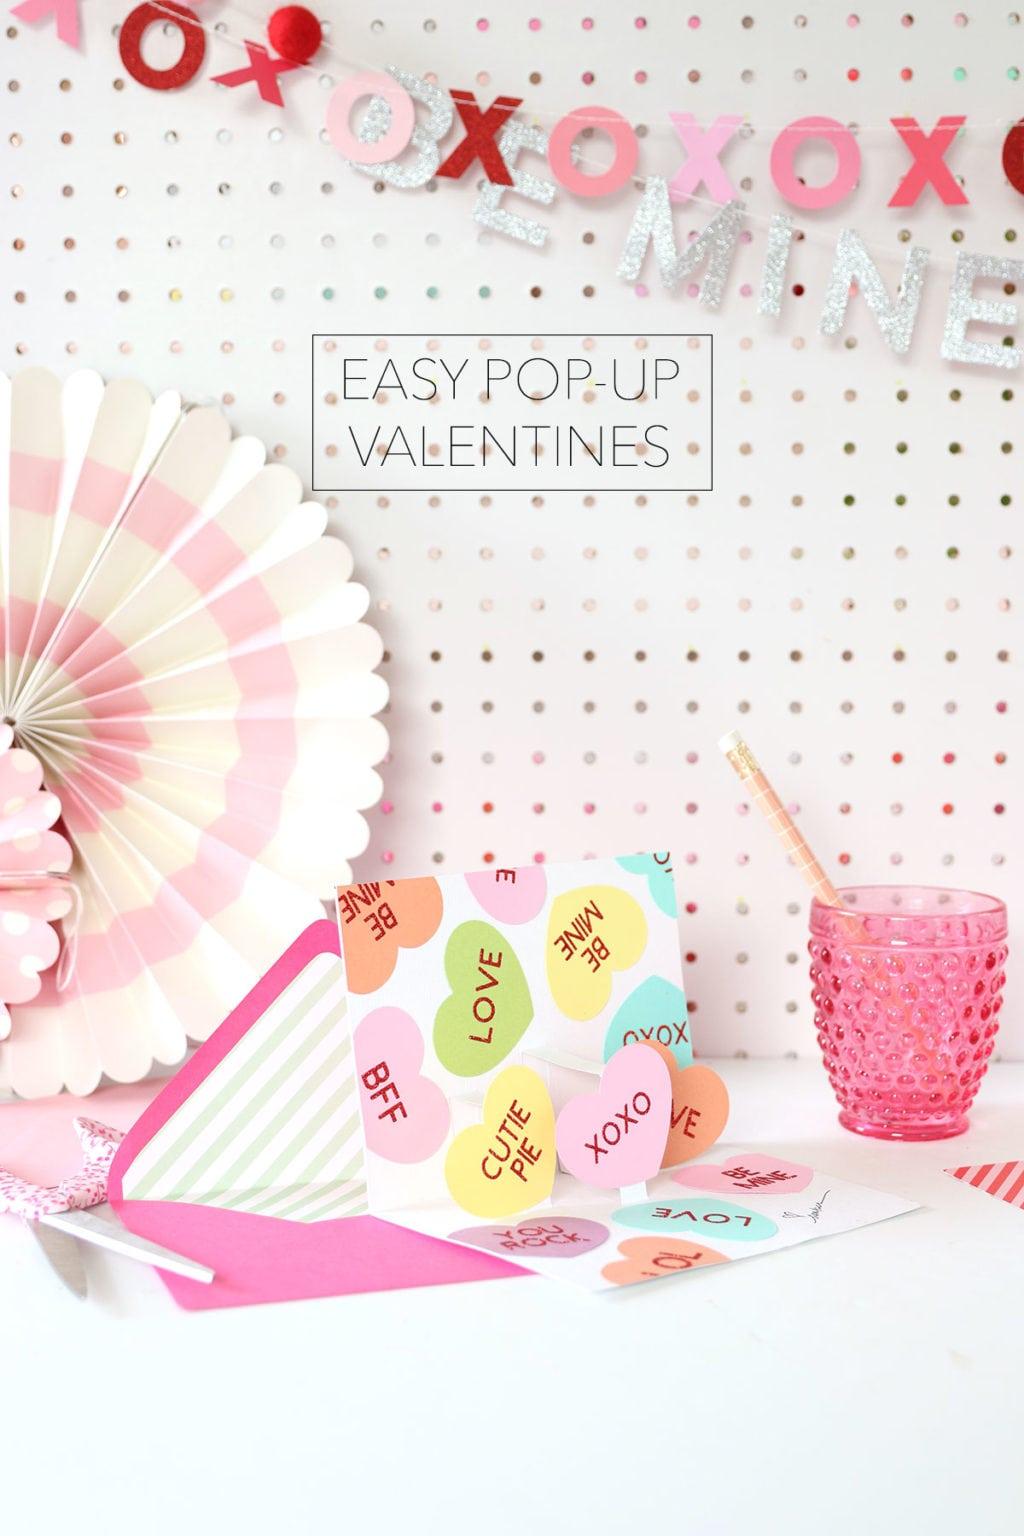 Easy Diy Pop-Up Valentine's Day Cards